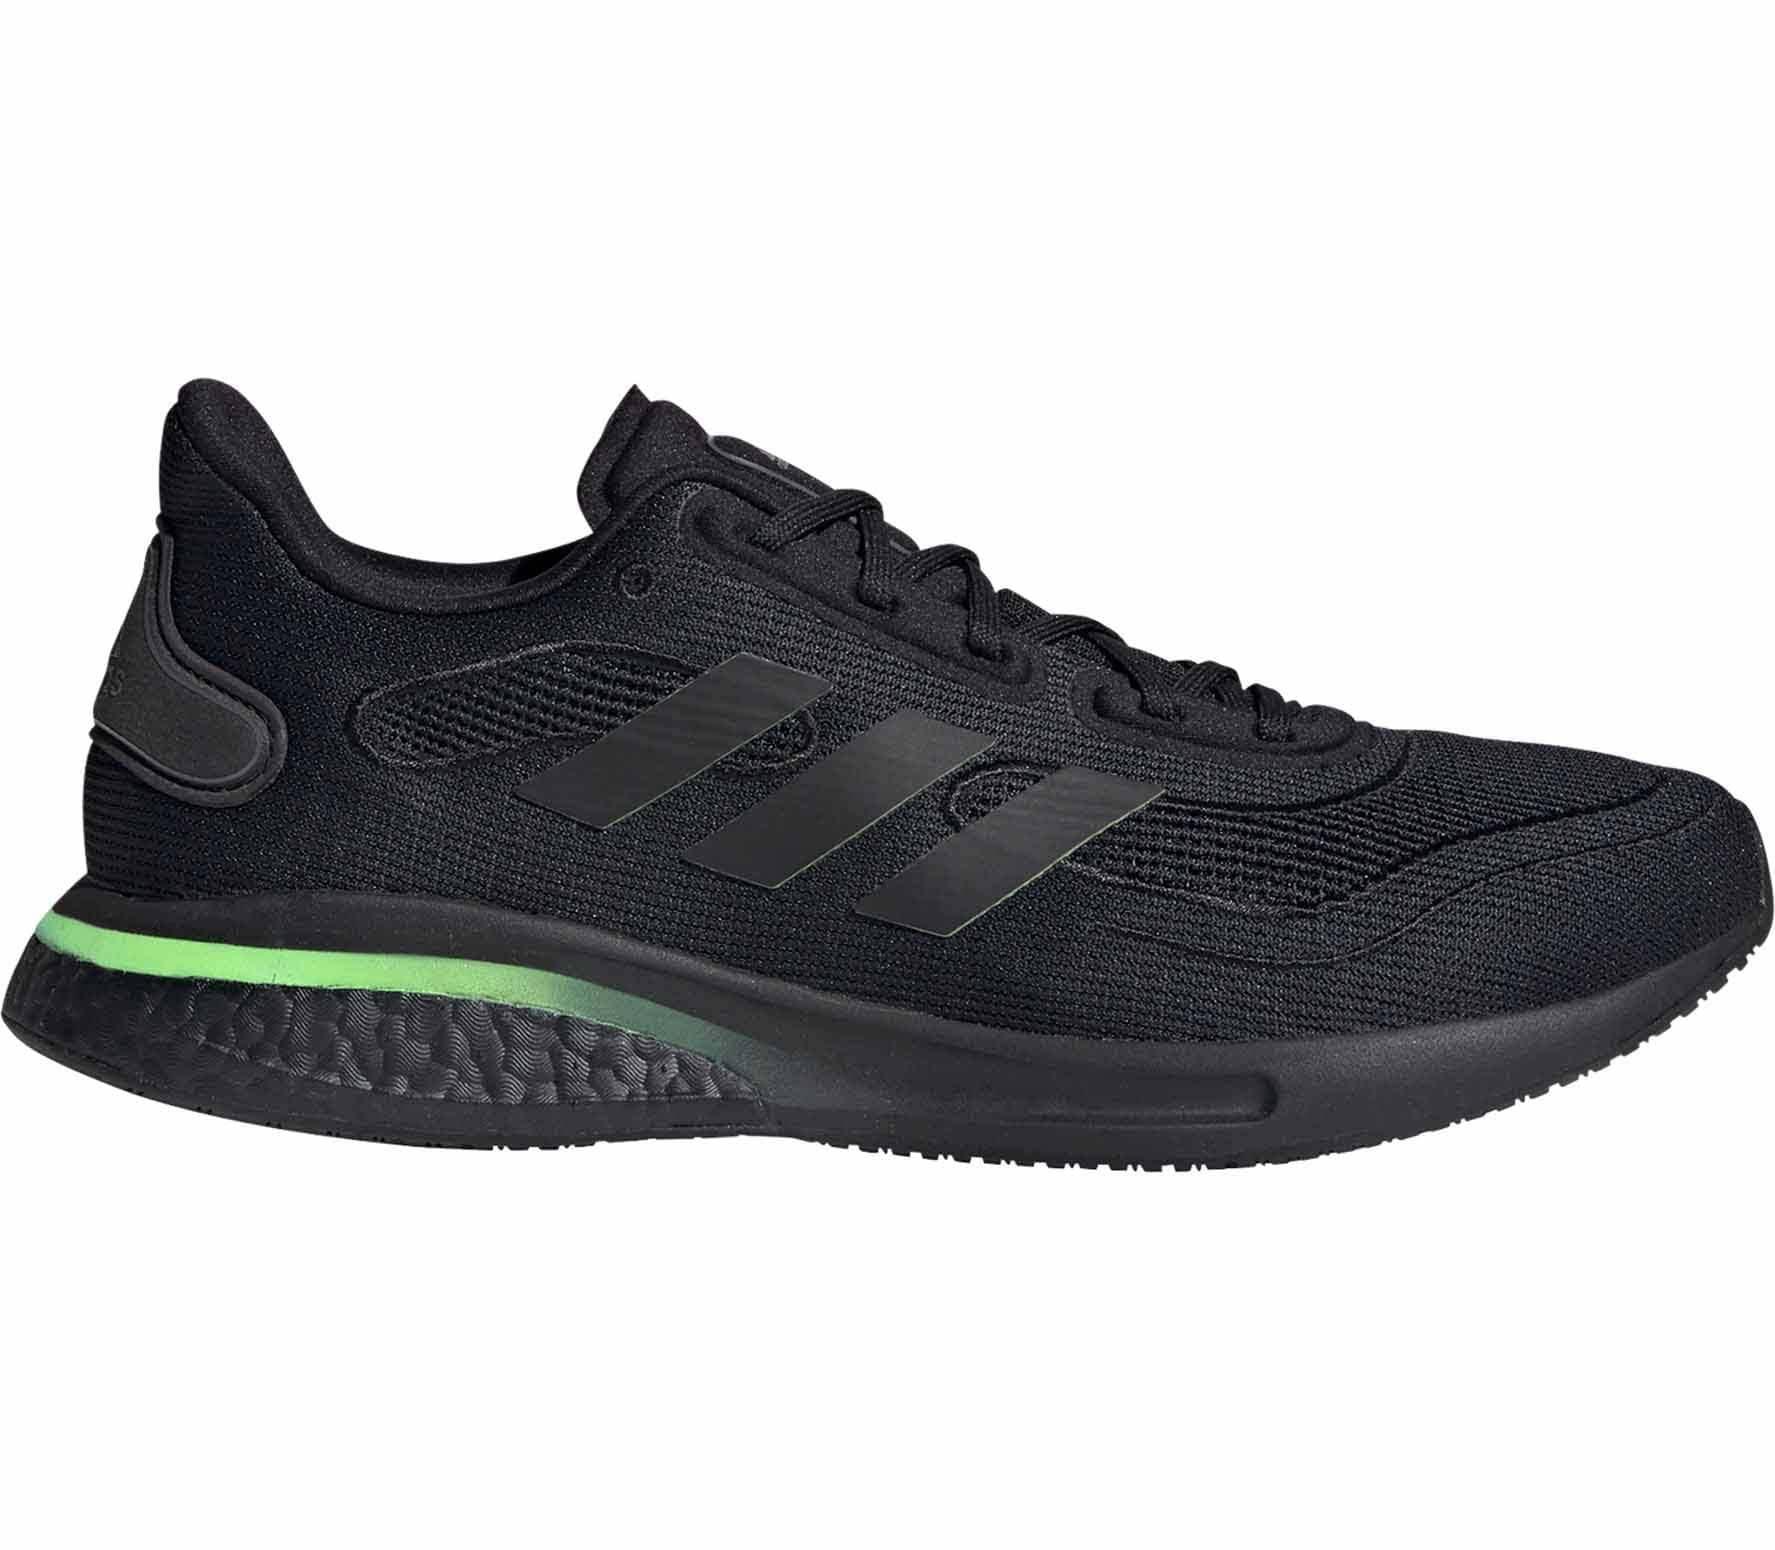 Adidas Supernova Shoes Running - Black